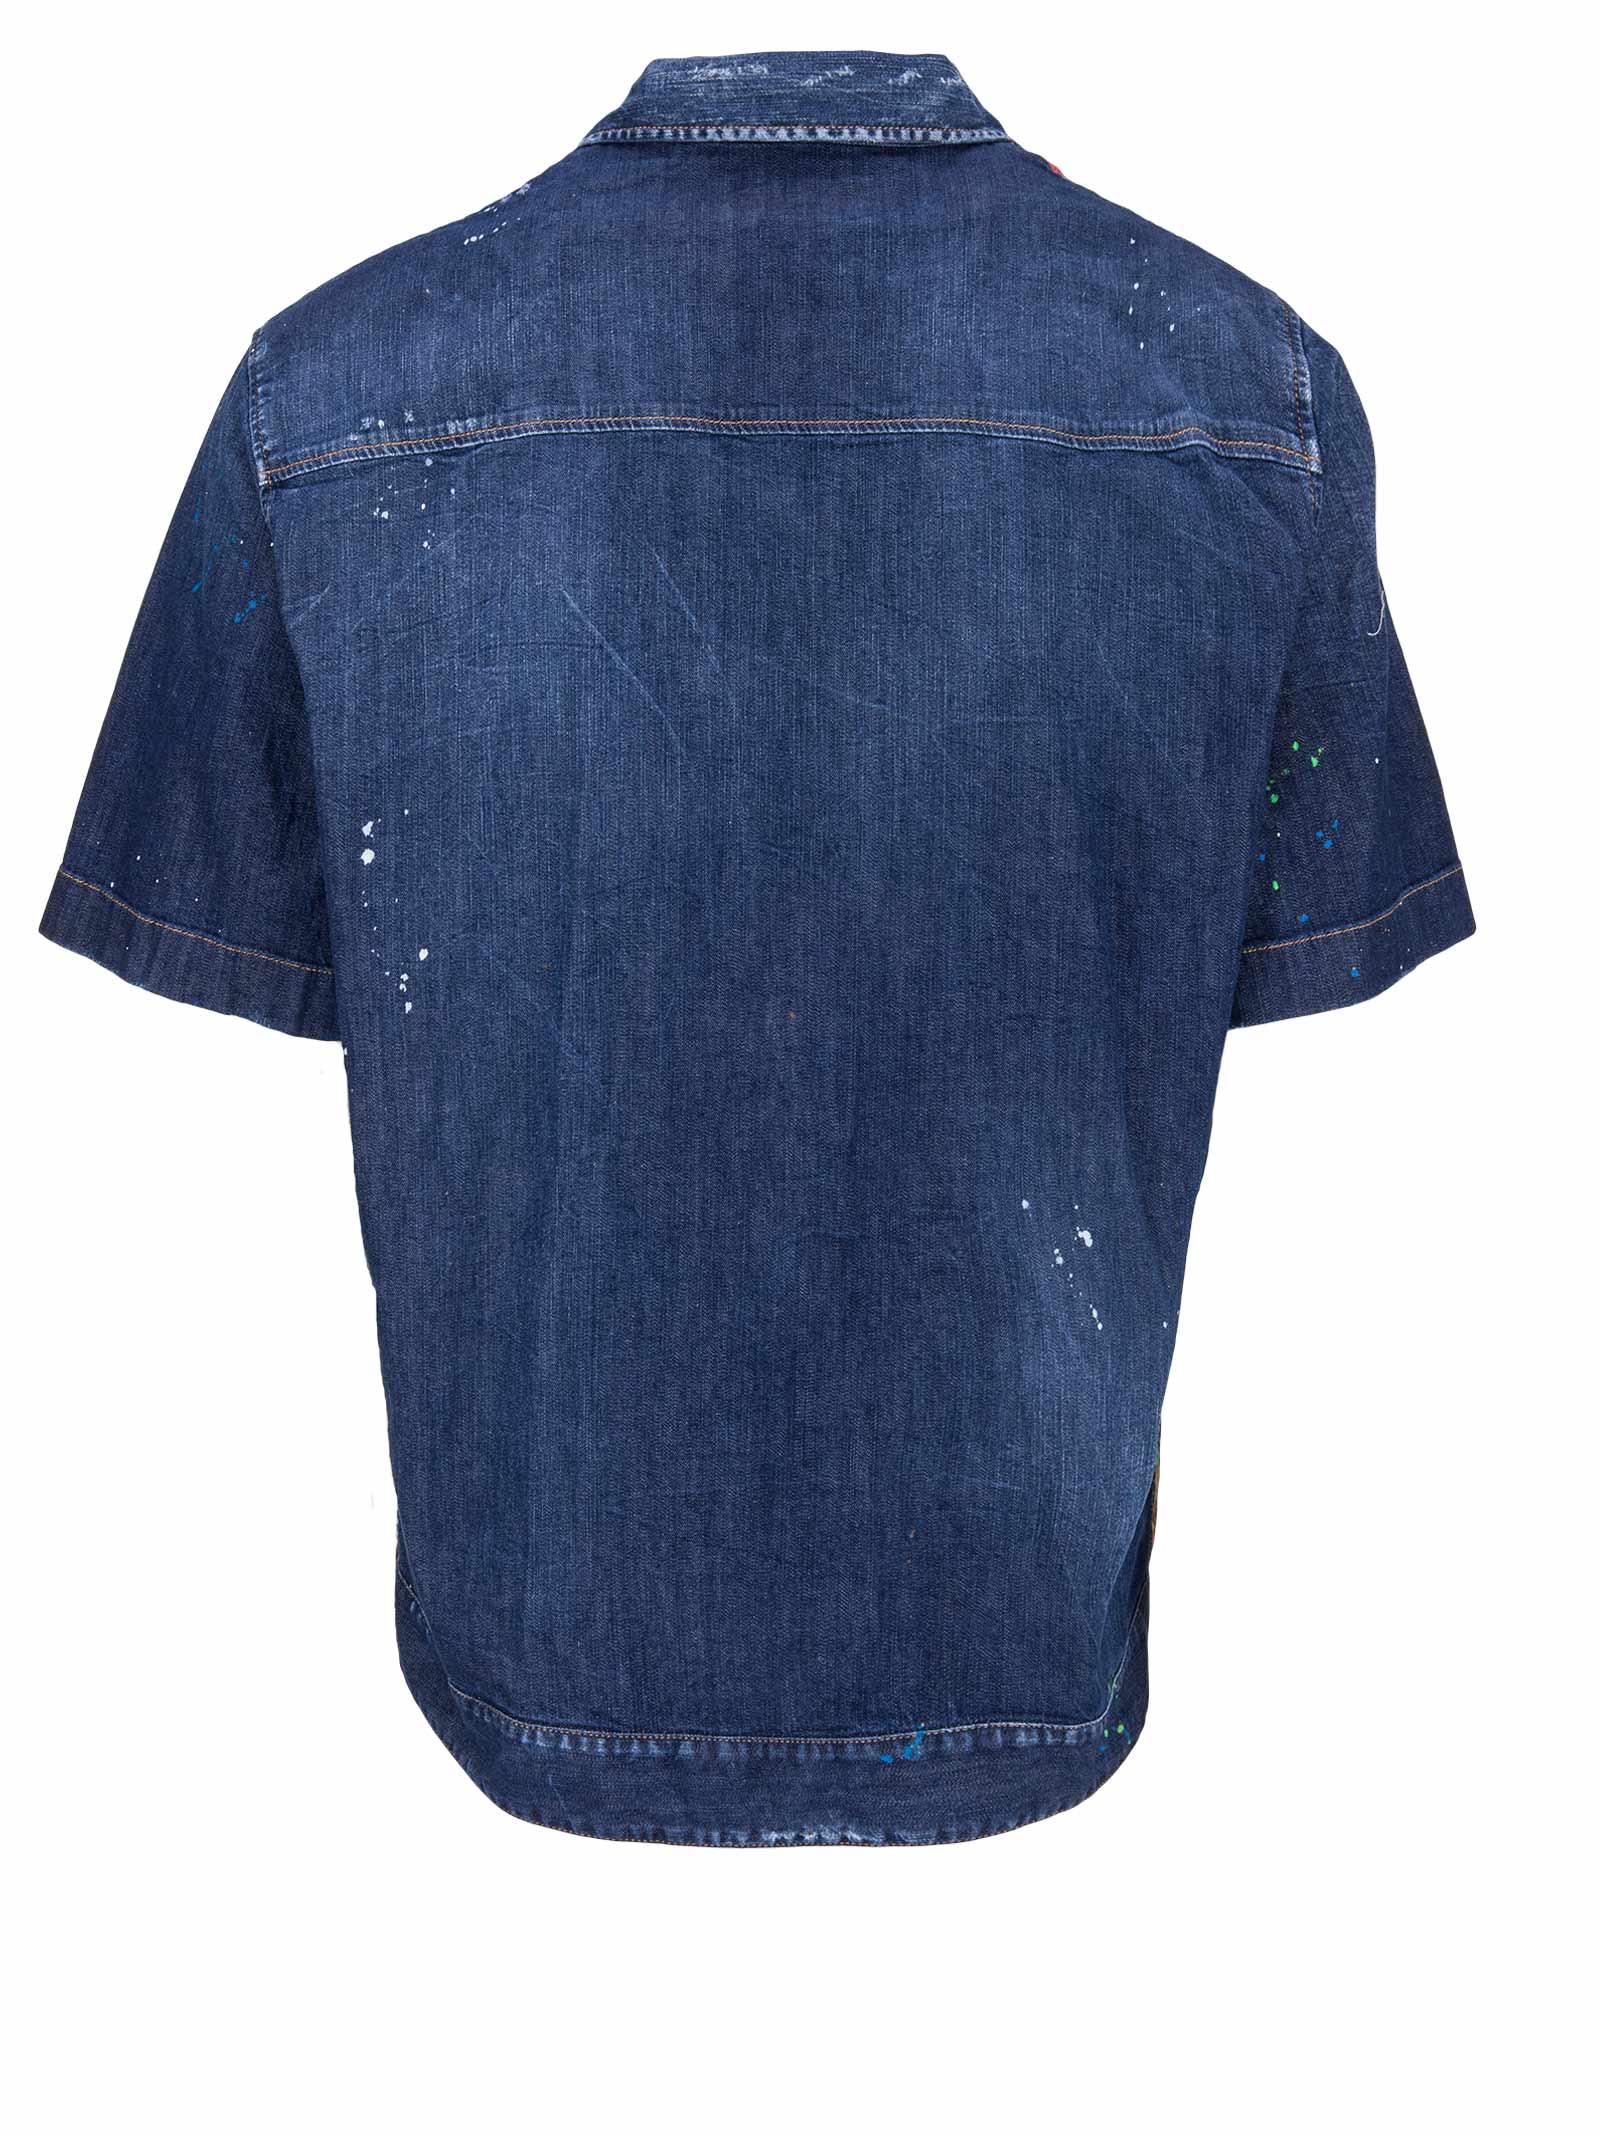 dfec377b Dsquared2 Shirt - Dsquared2 - Michele Franzese Moda